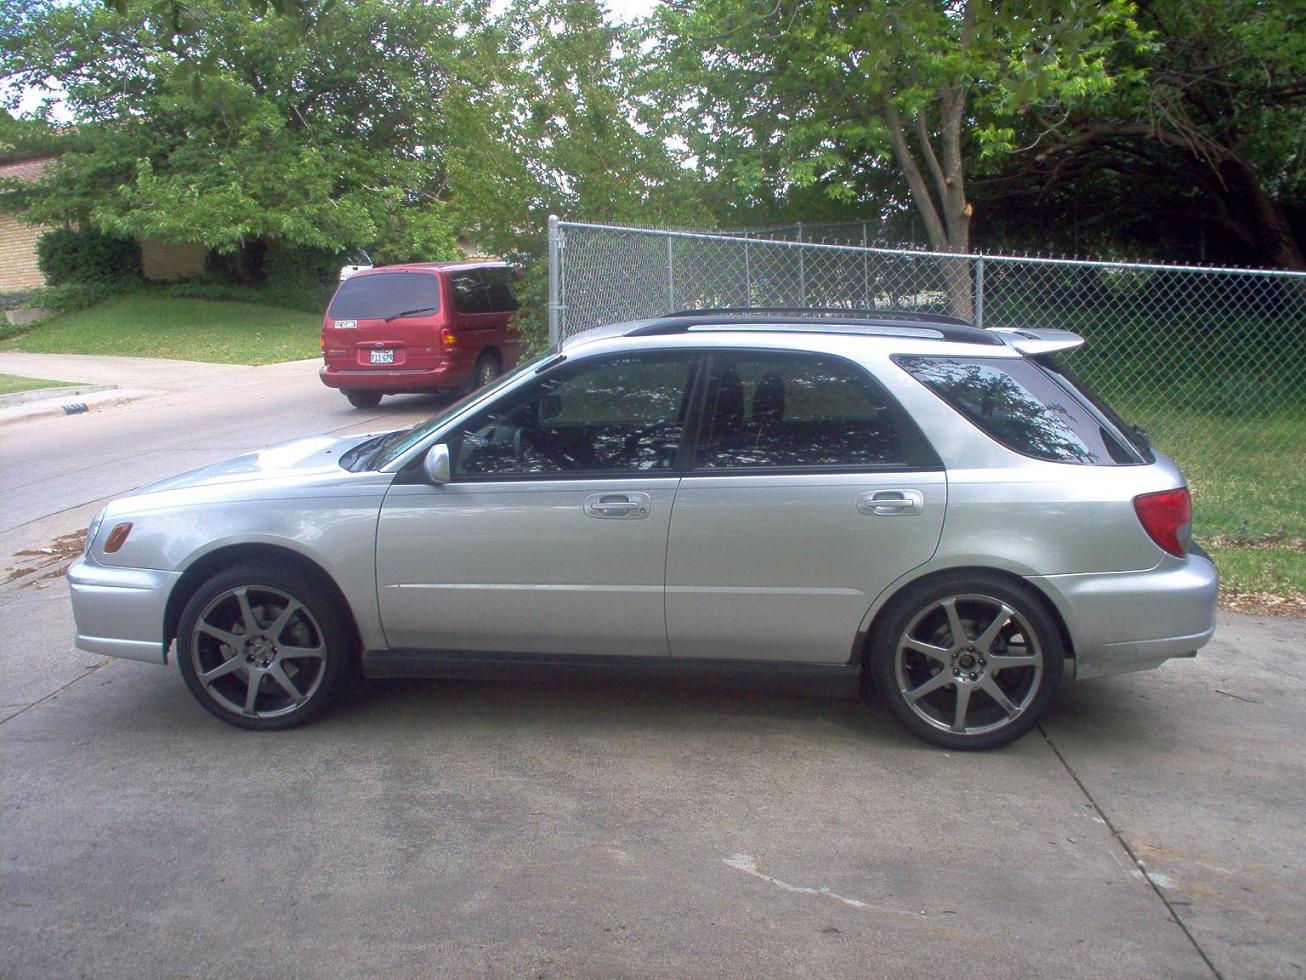 2002 Subaru Impreza Wrx Wagon 1 4 Mile Drag Racing Timeslip Specs 0 60 Dragtimes Com